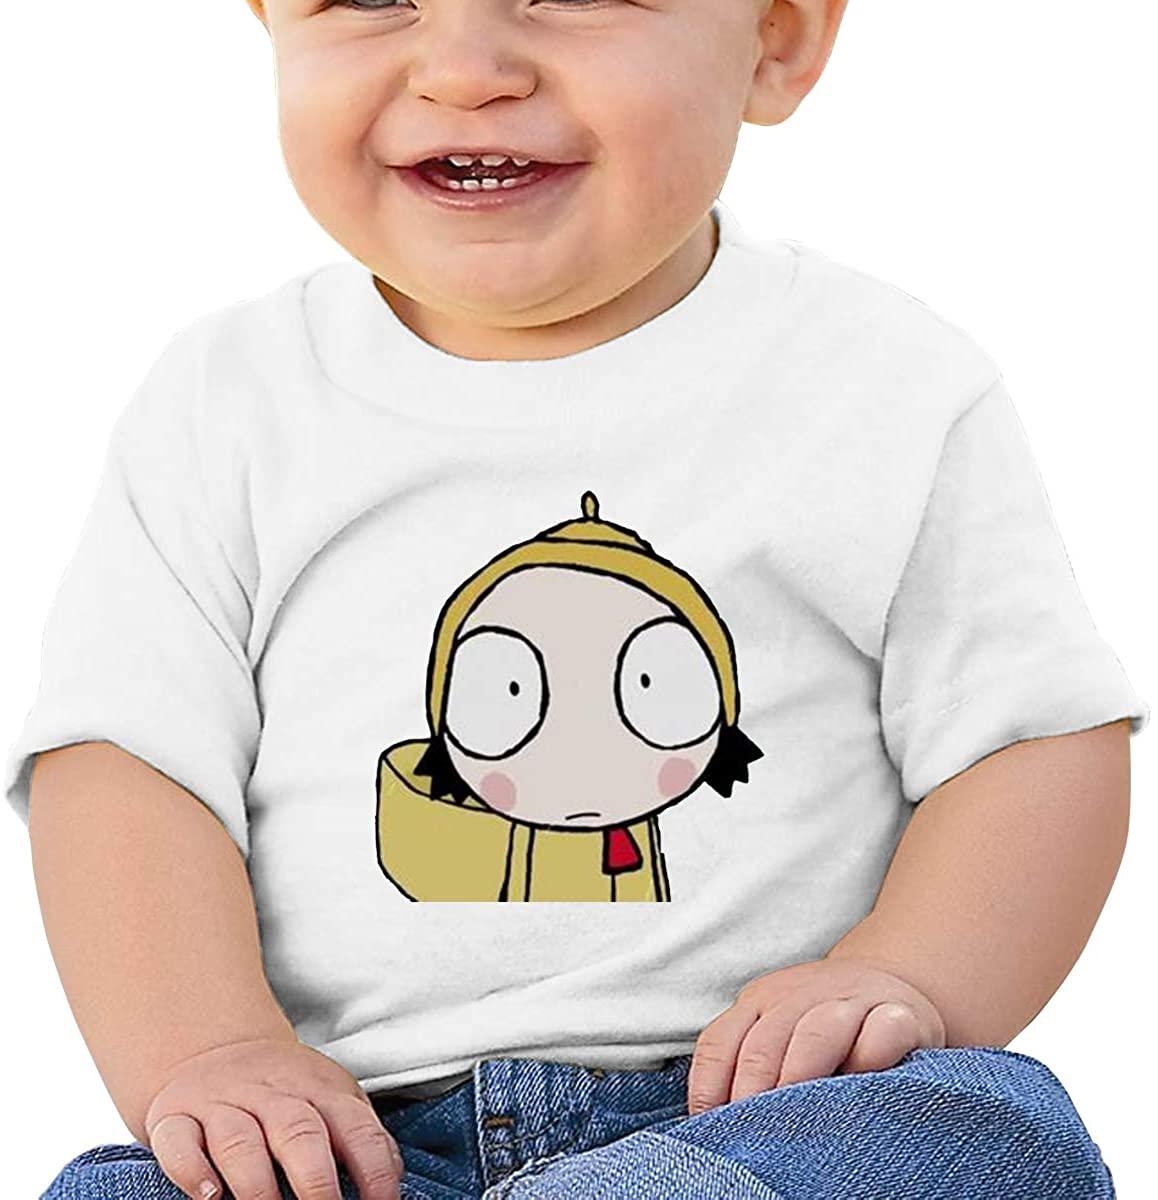 6-24 Months Boy and Girl Baby Short Sleeve T-Shirt Sarah & Duck Logo Original Minimalist Style White